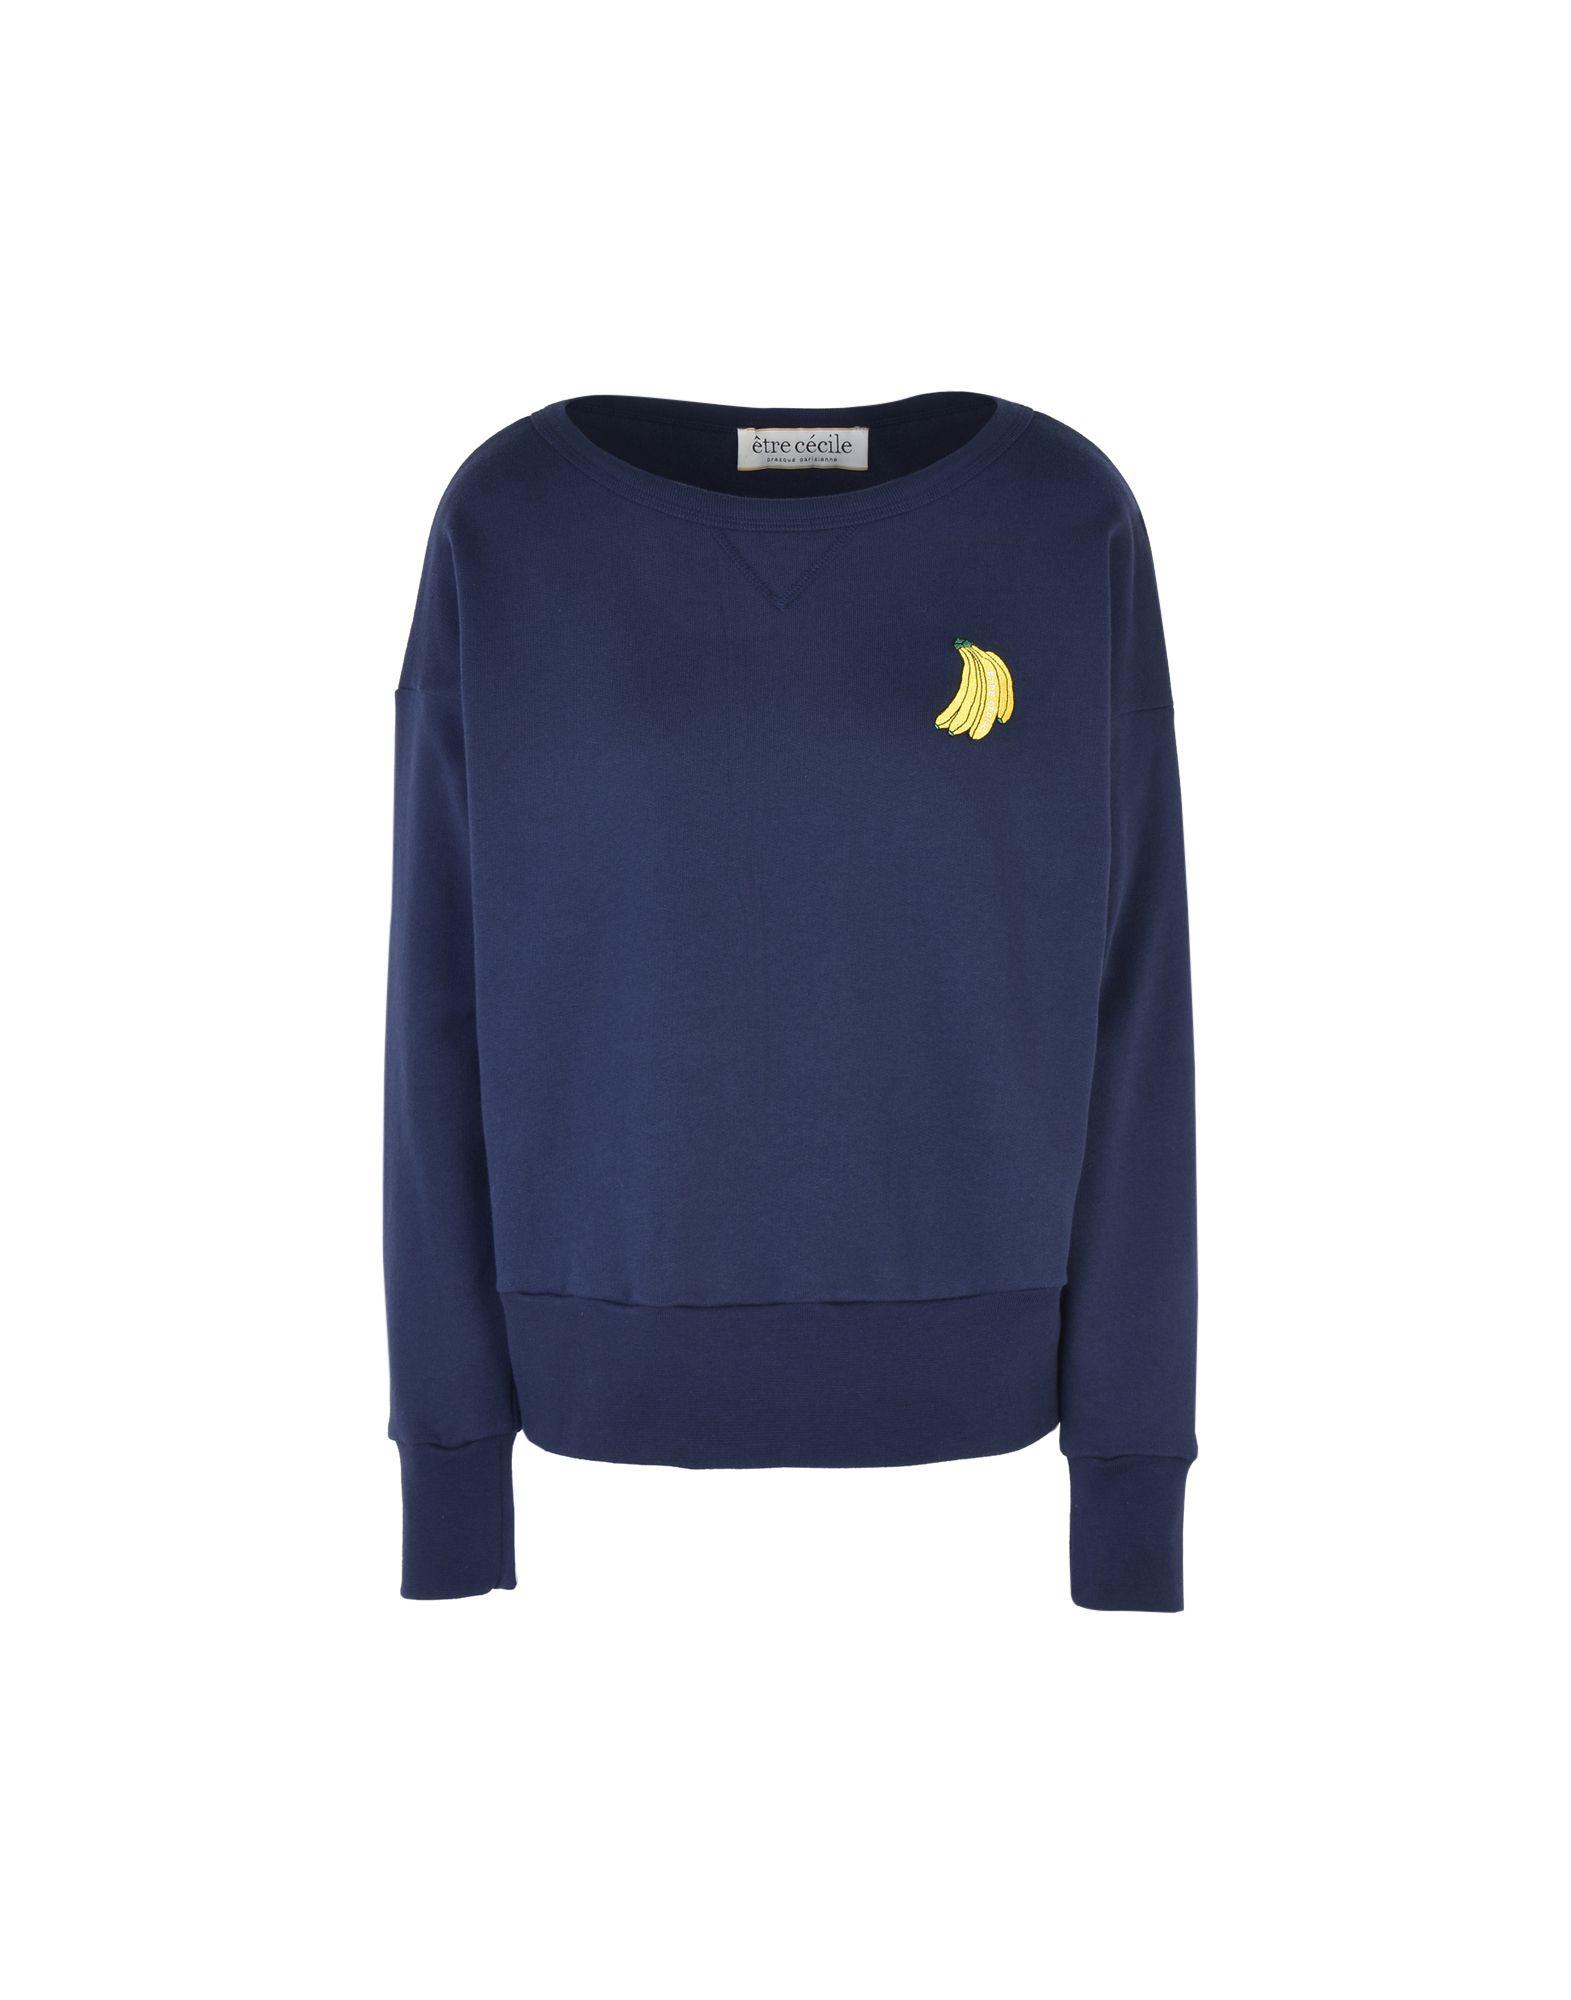 Felpa Être Cécile Banana Vintage Sweatshirt - Donna - Acquista online su ME3tSULjm